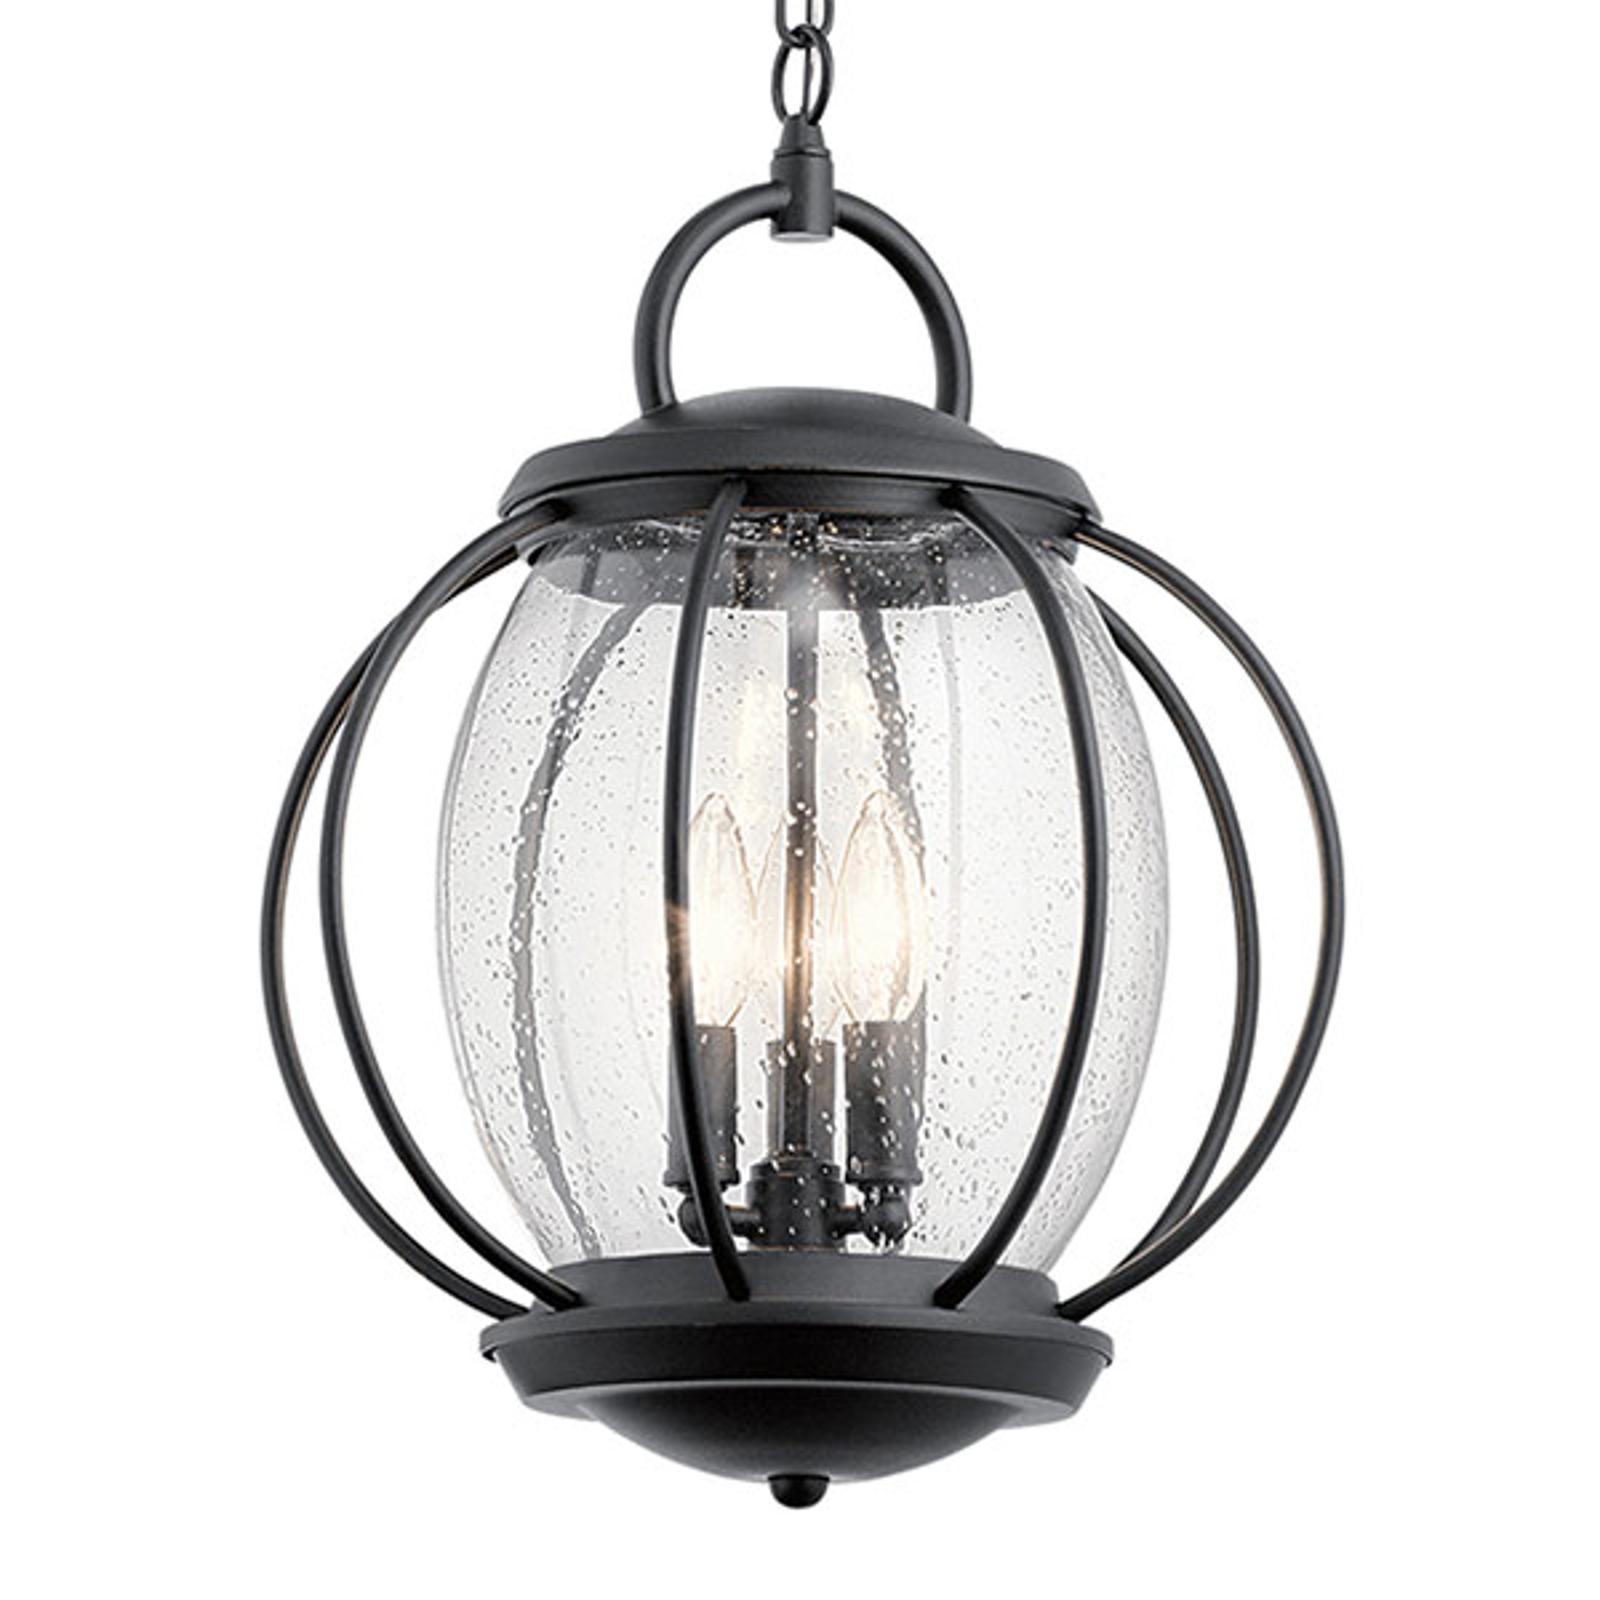 Pendellampa Vandalia 3 lampor